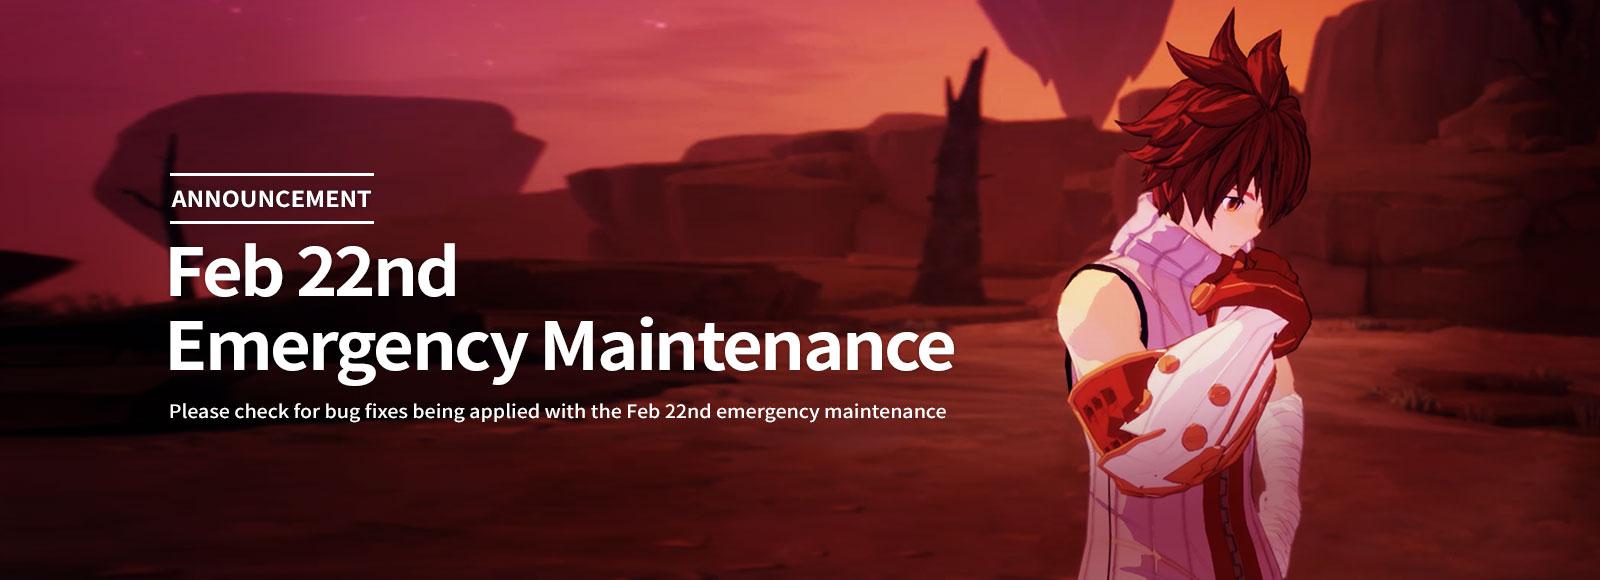 Feb 22nd Emergency Maintenance